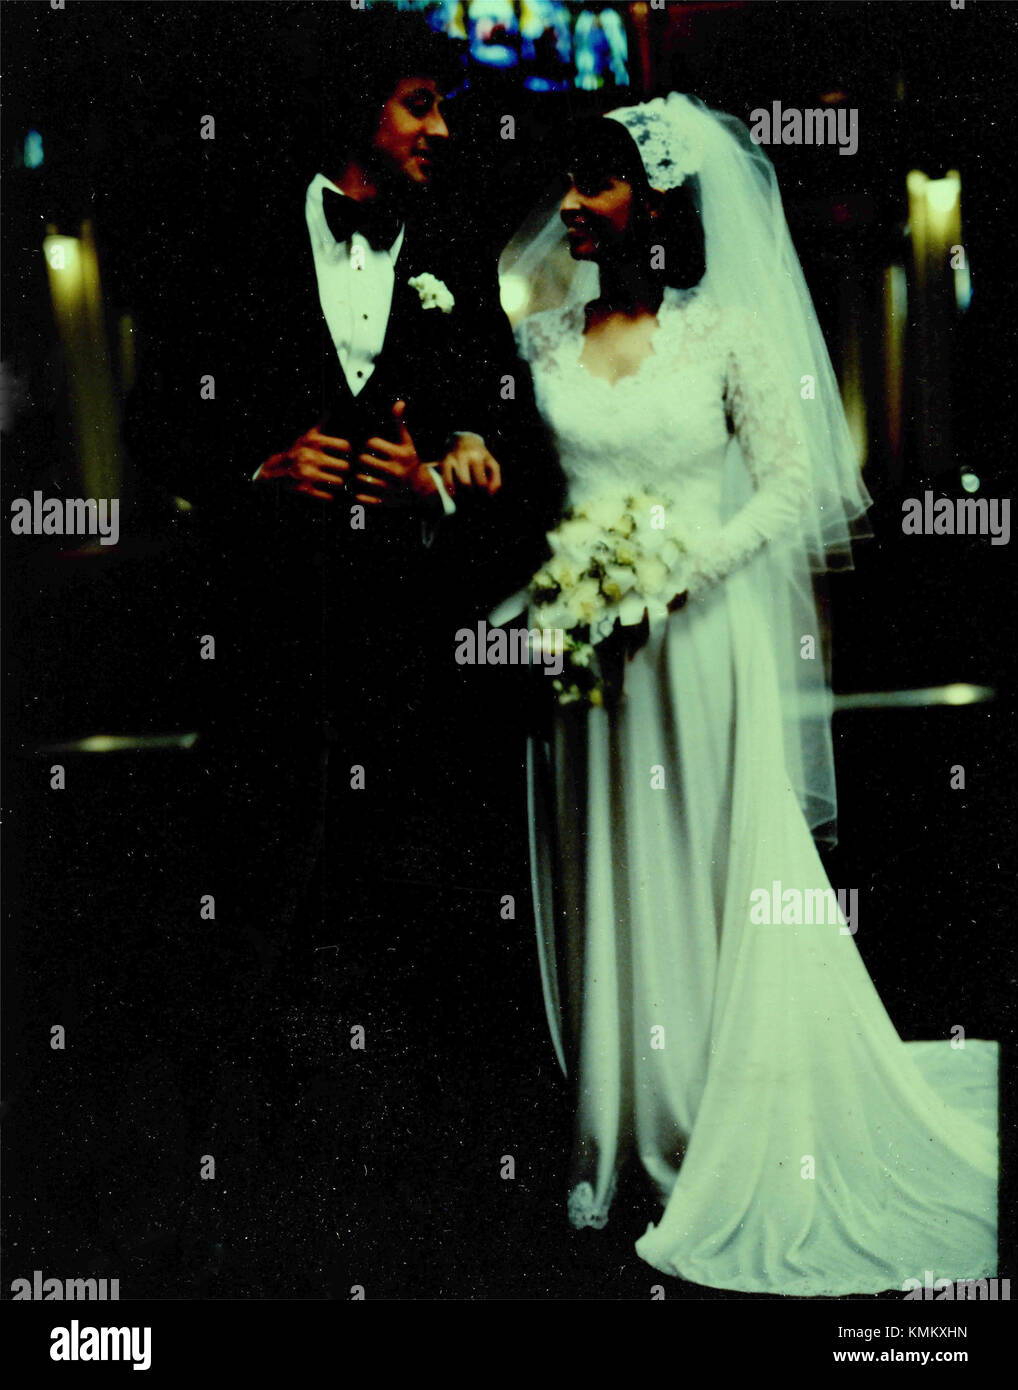 Sylvester Stallone et Talia Shire dans le film Rocky, 1976 Photo Stock